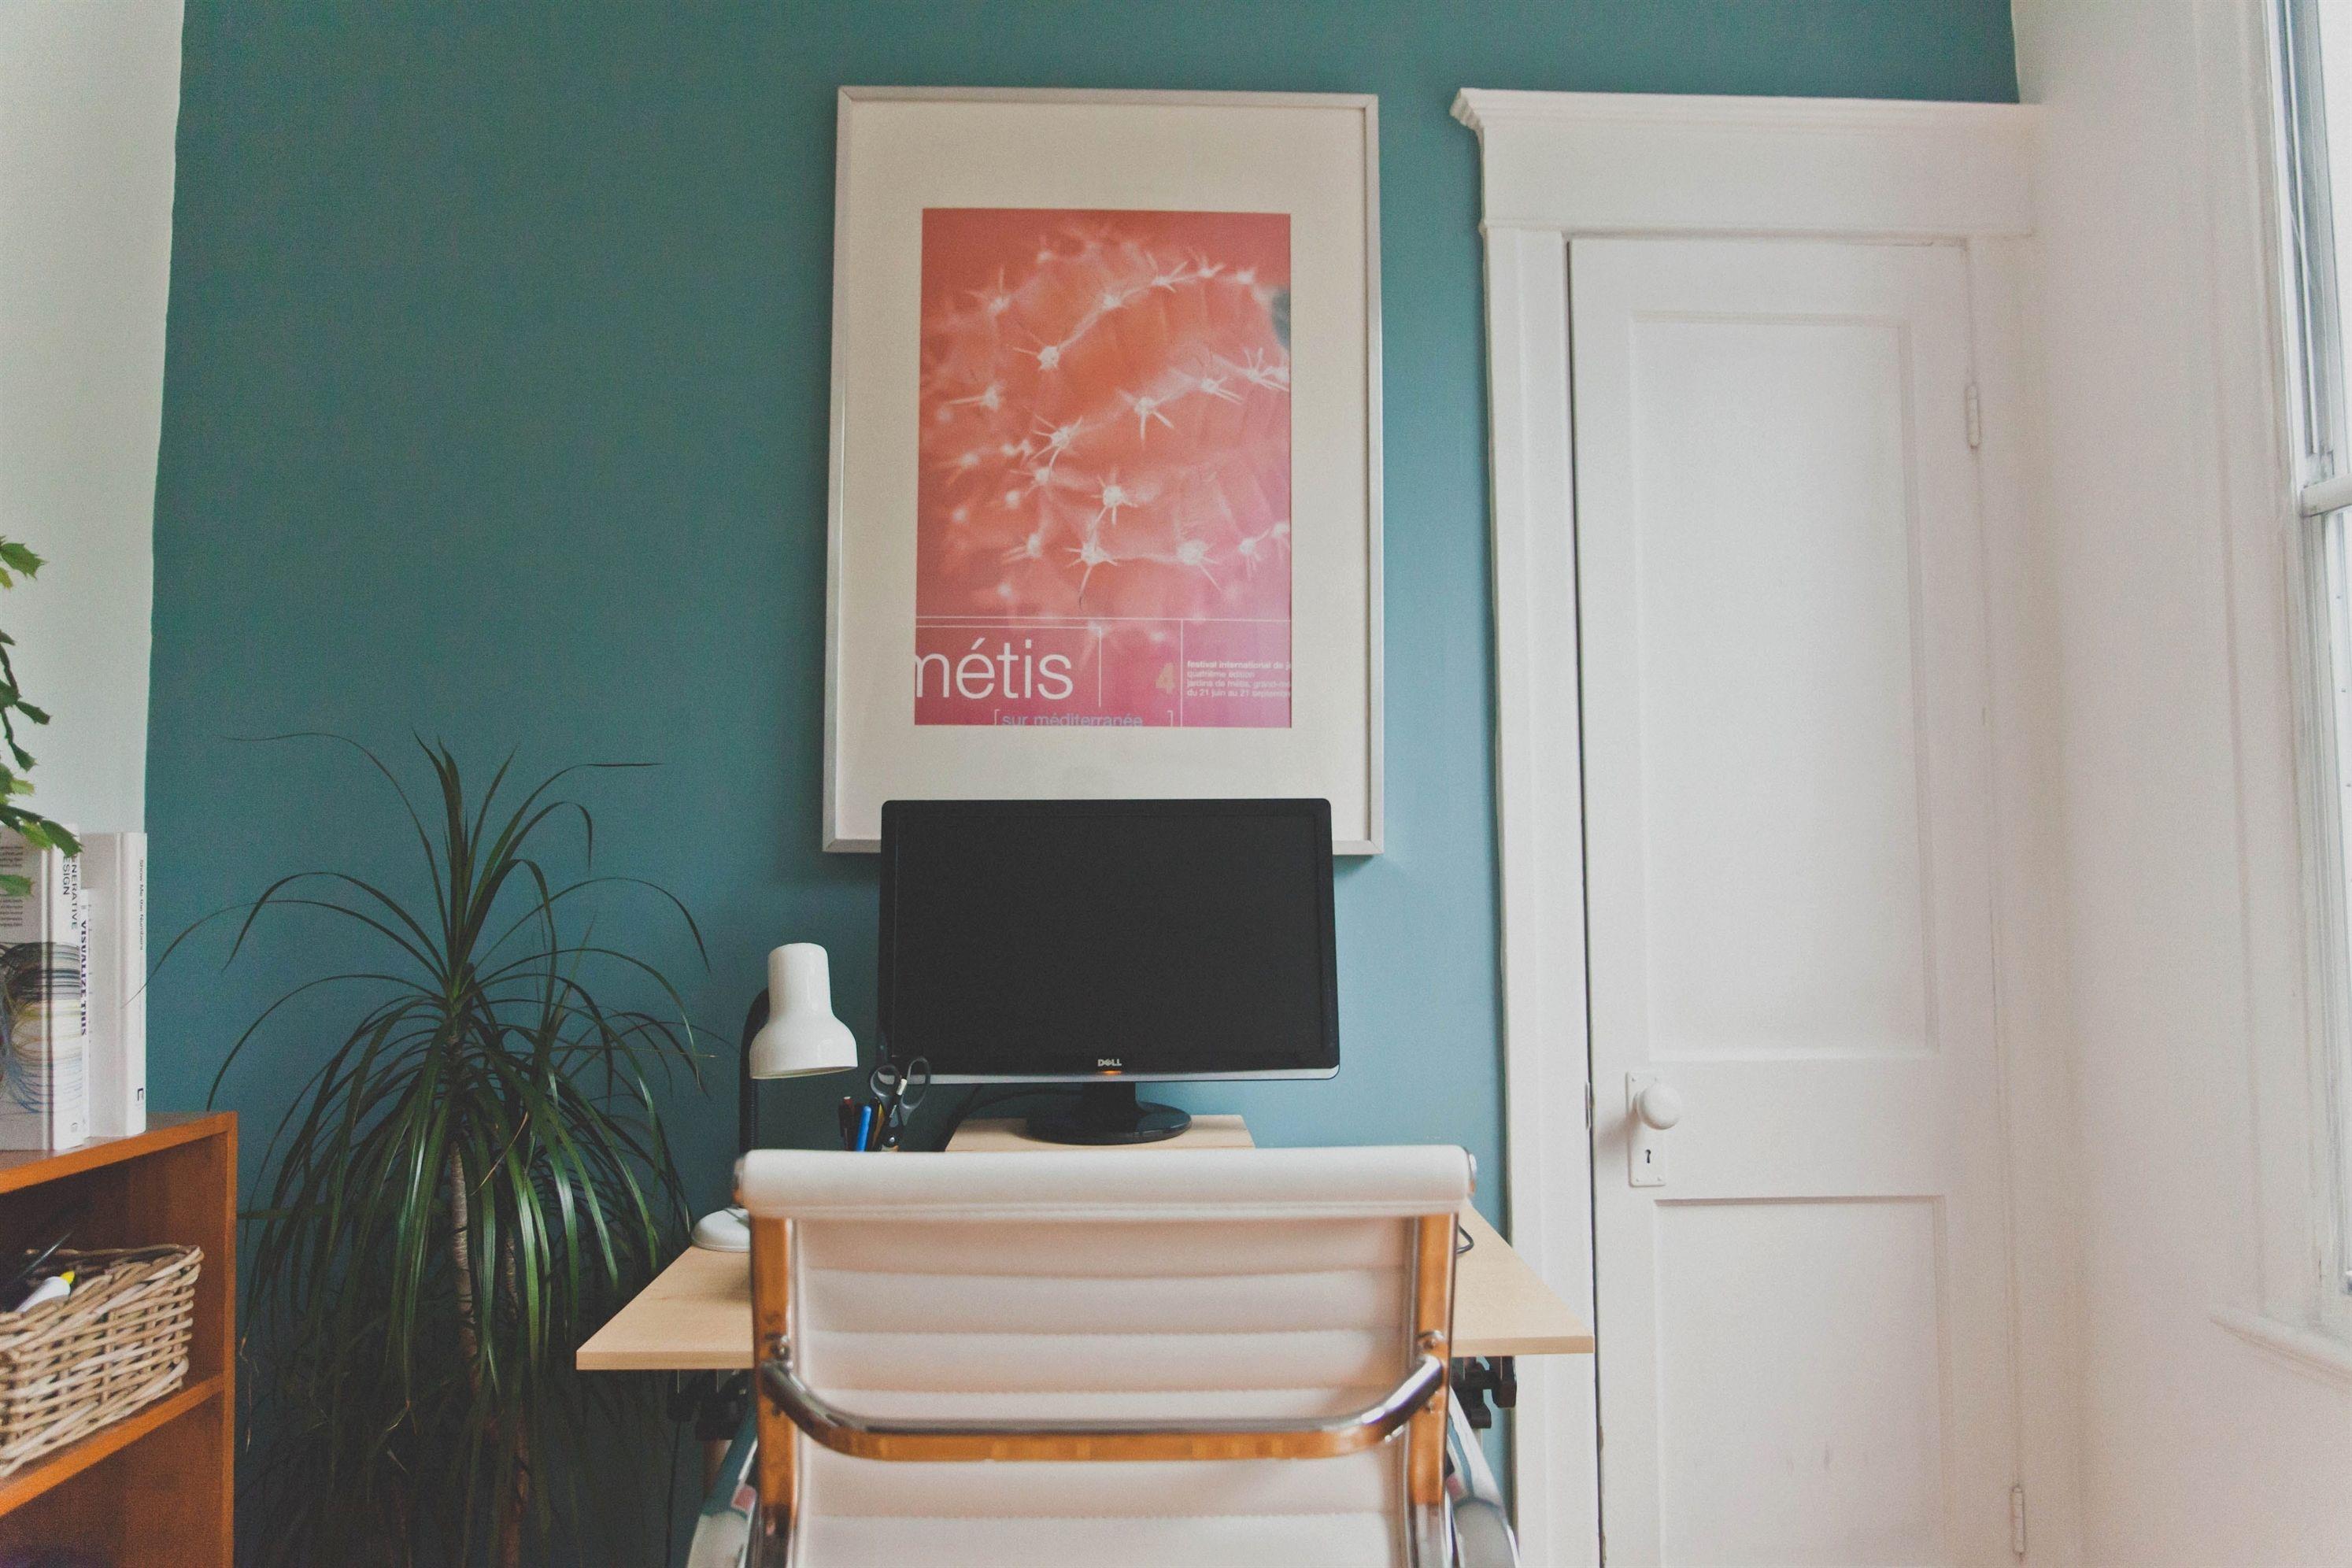 Sims home decor affordable online catalogs asmr youtube also rh pinterest